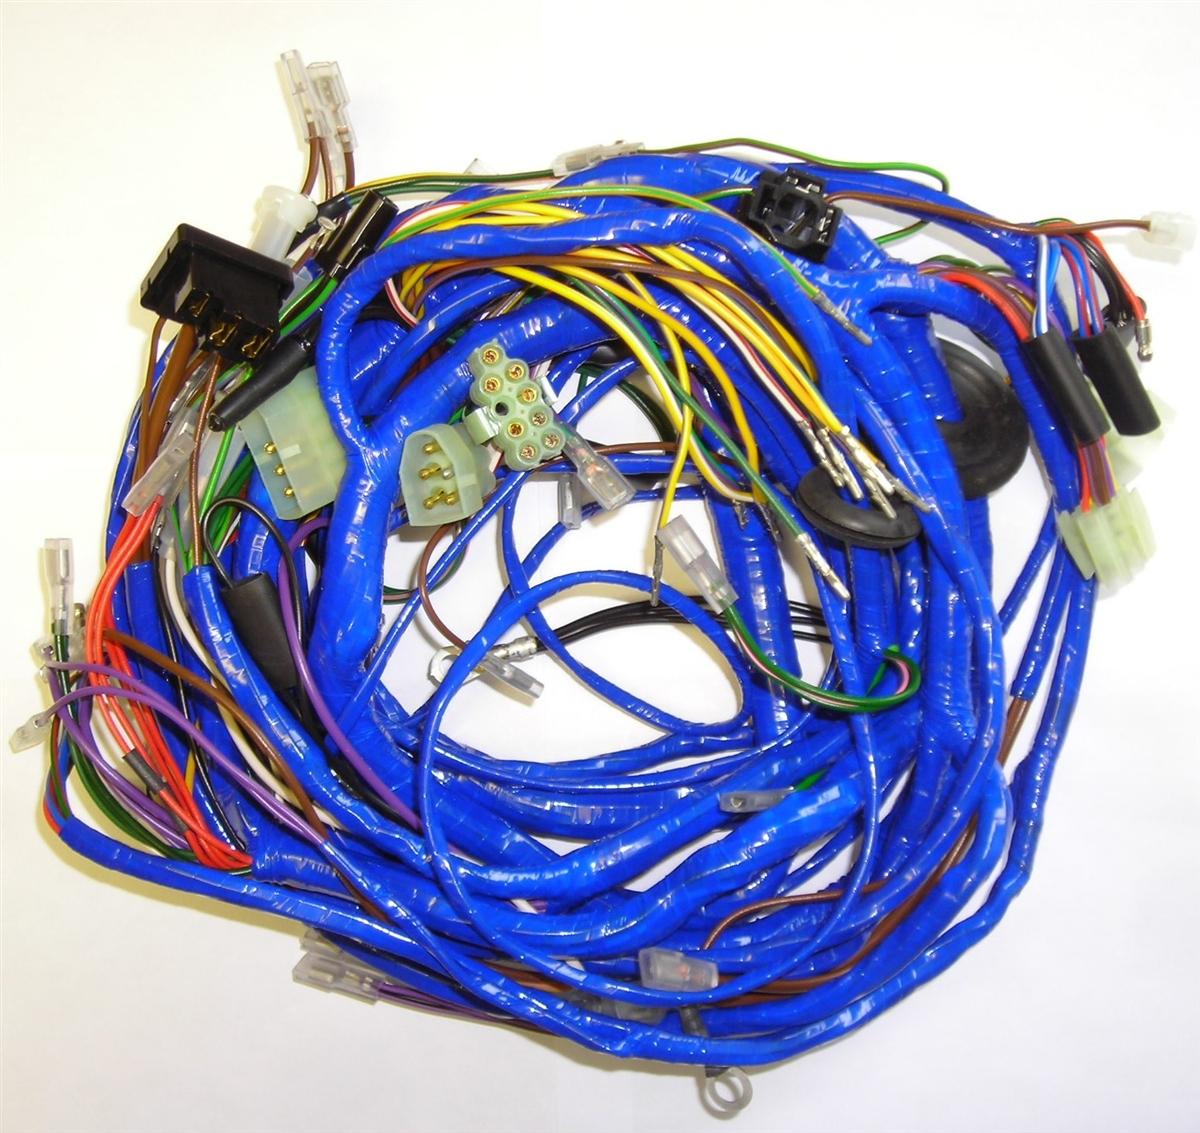 medium resolution of main wiring harness mg midget 1978 mg midget wiring harness mg midget wiring harness